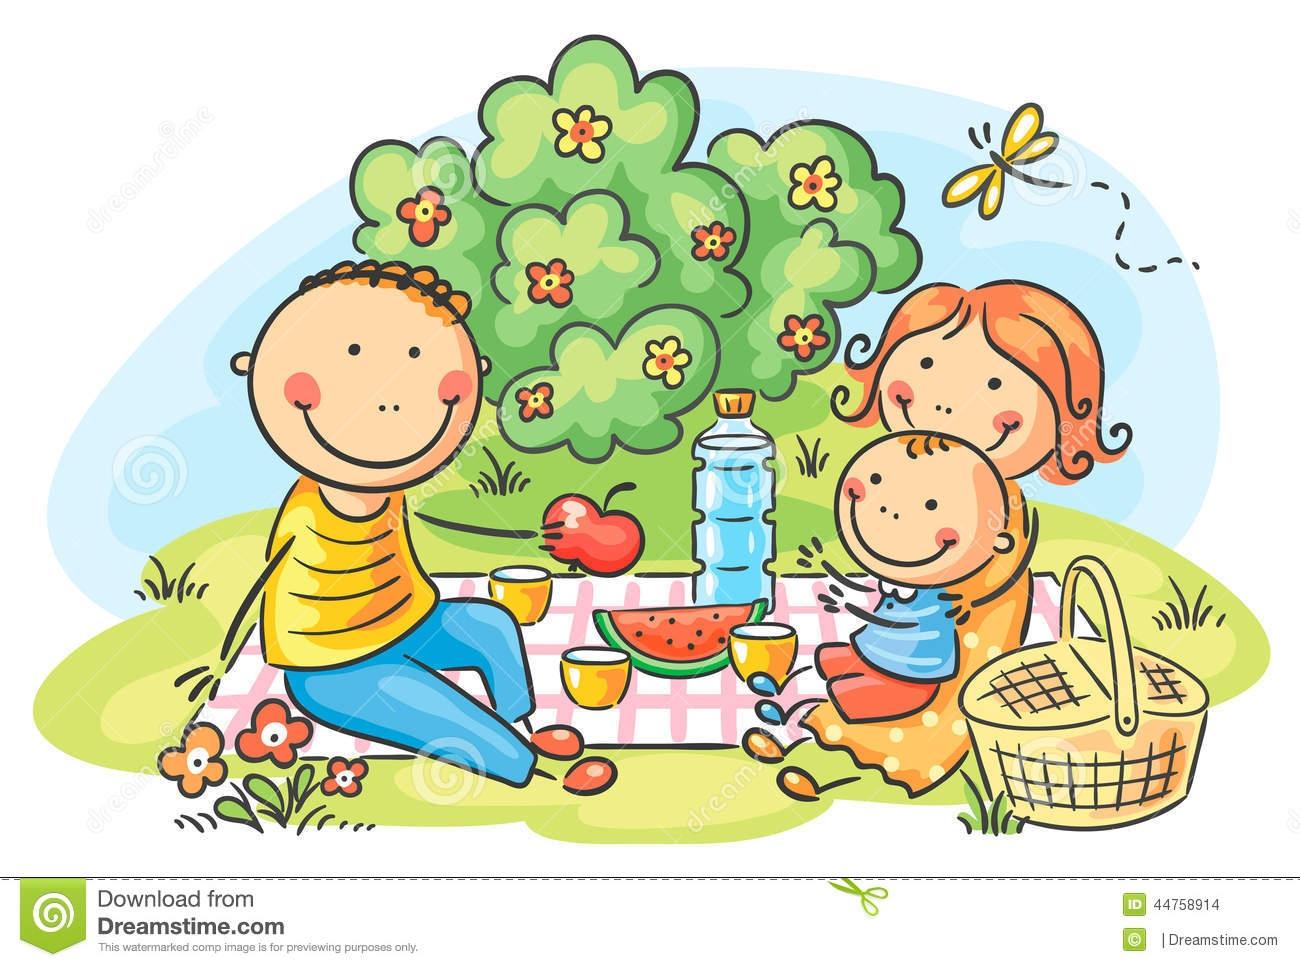 family picnic clipart - photo #15